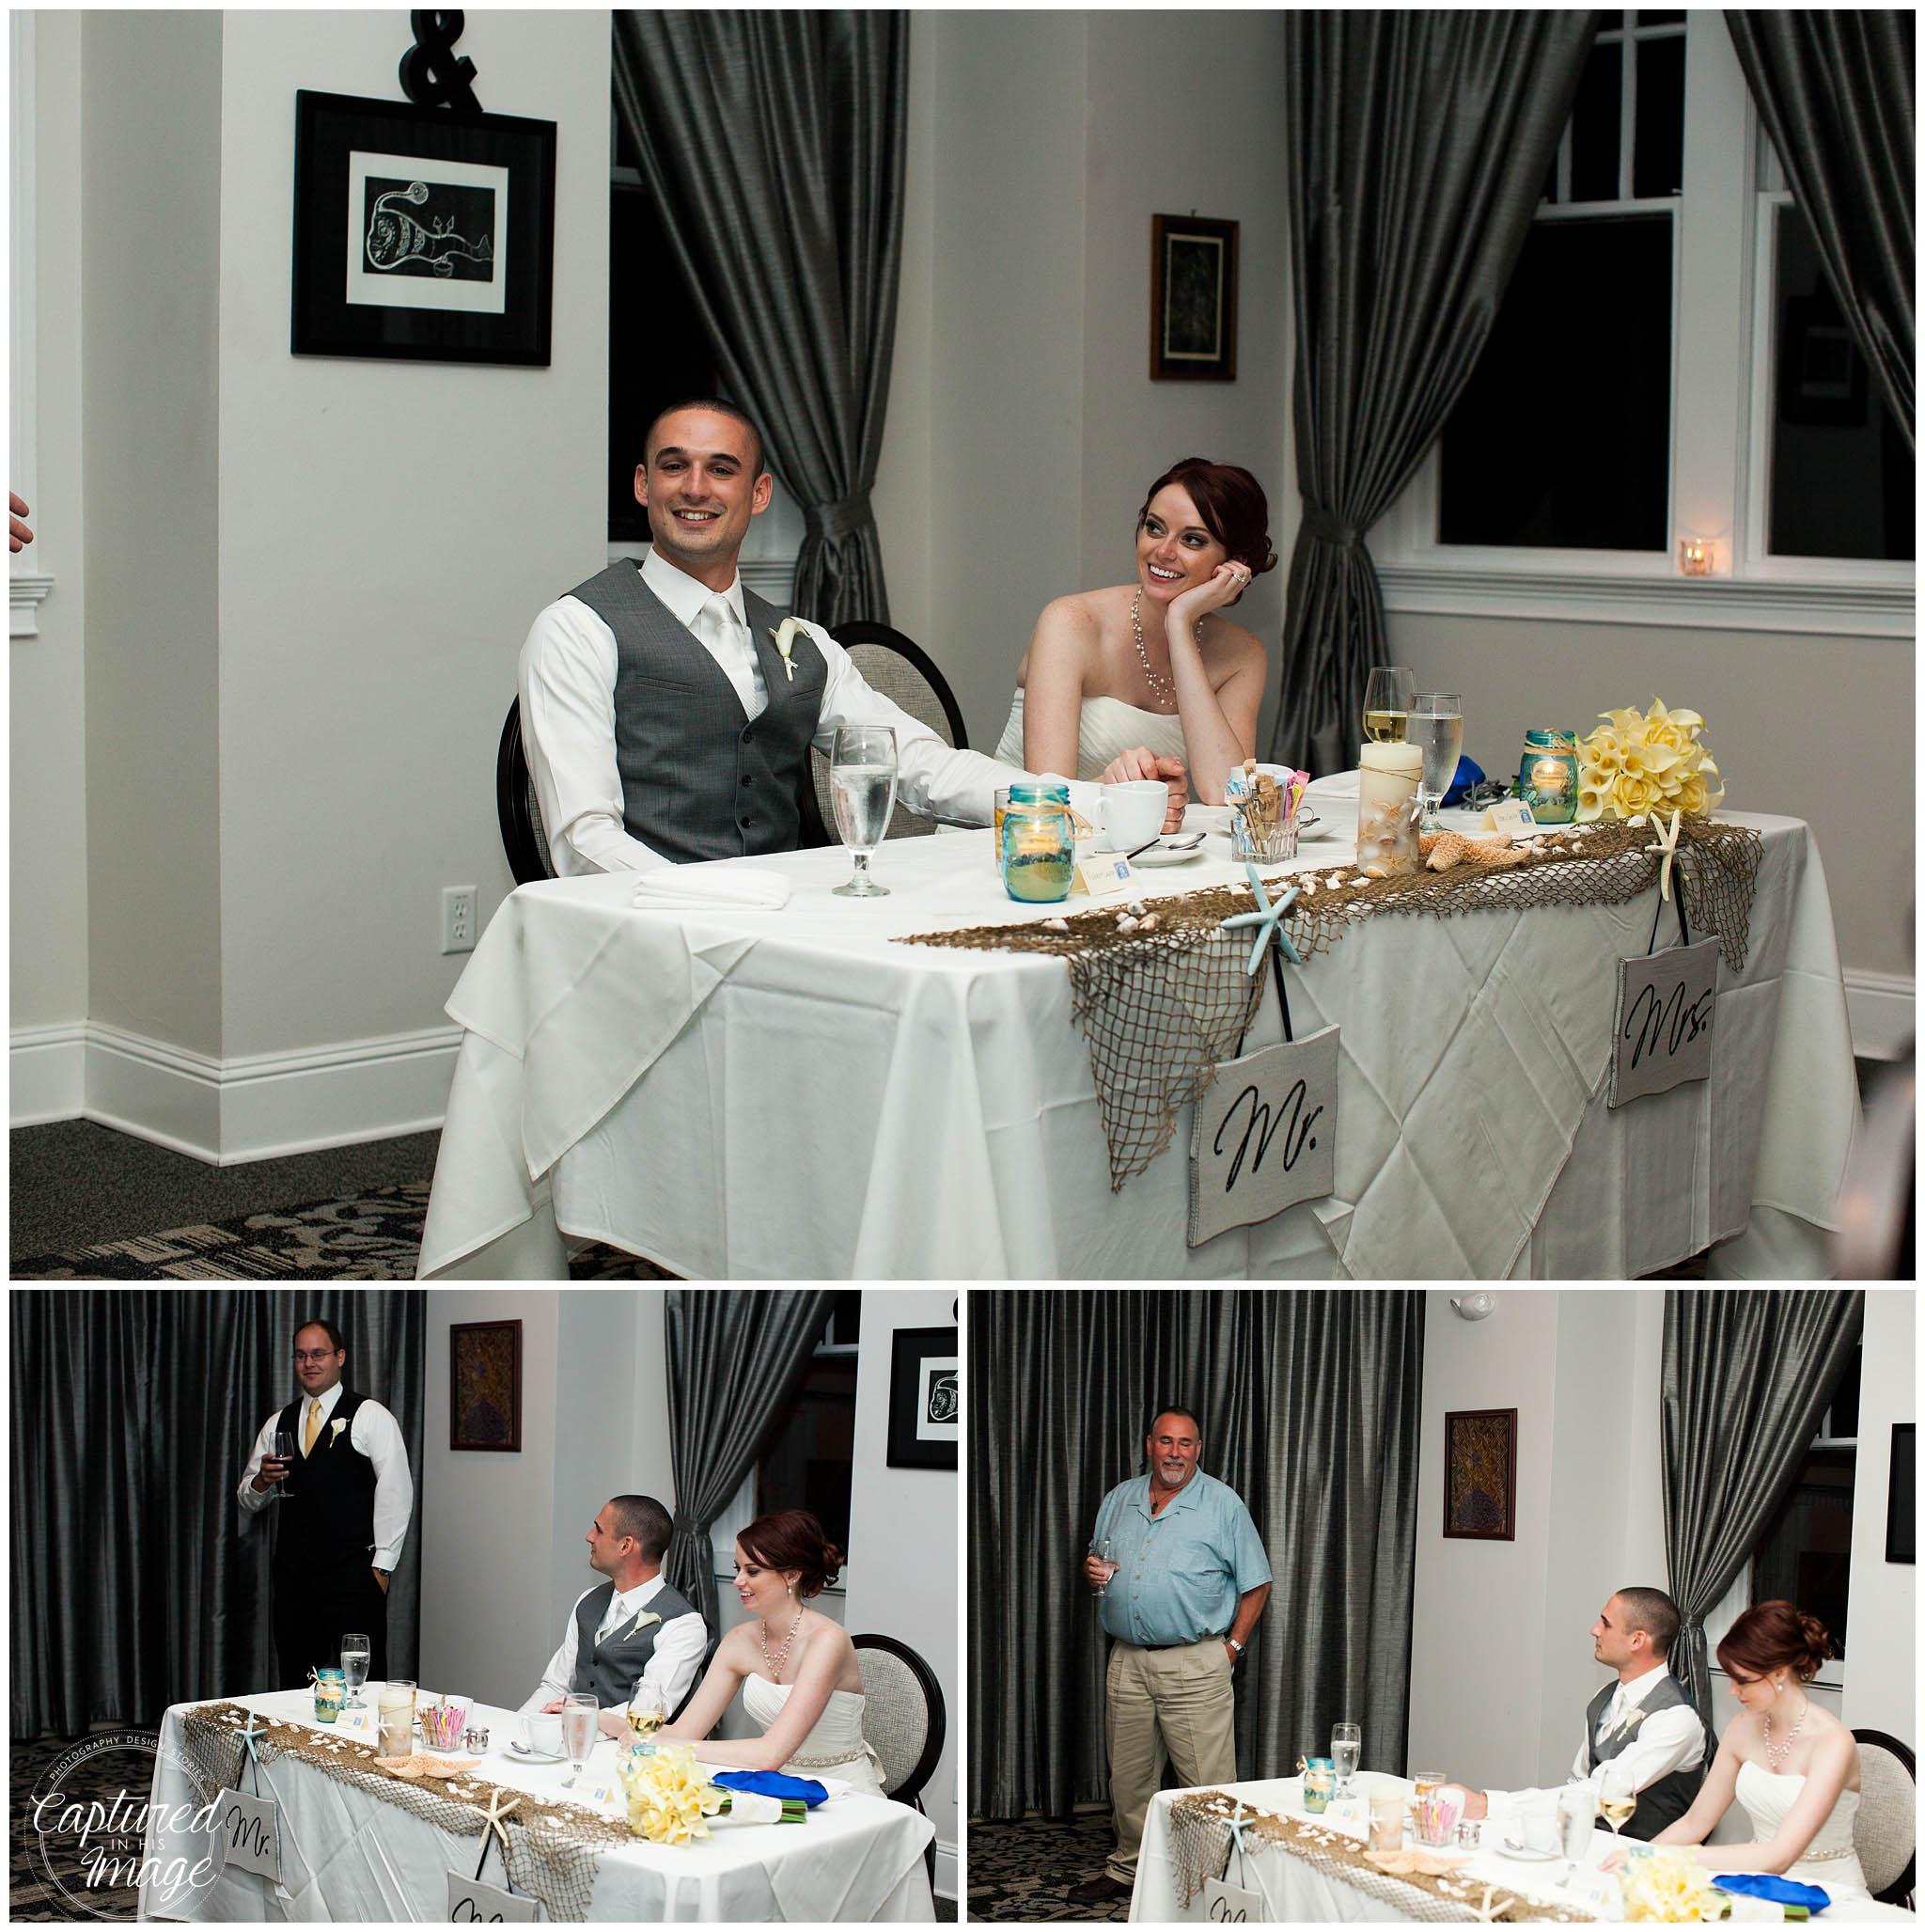 St. Pete Beach Destination Wedding (75 of 81)